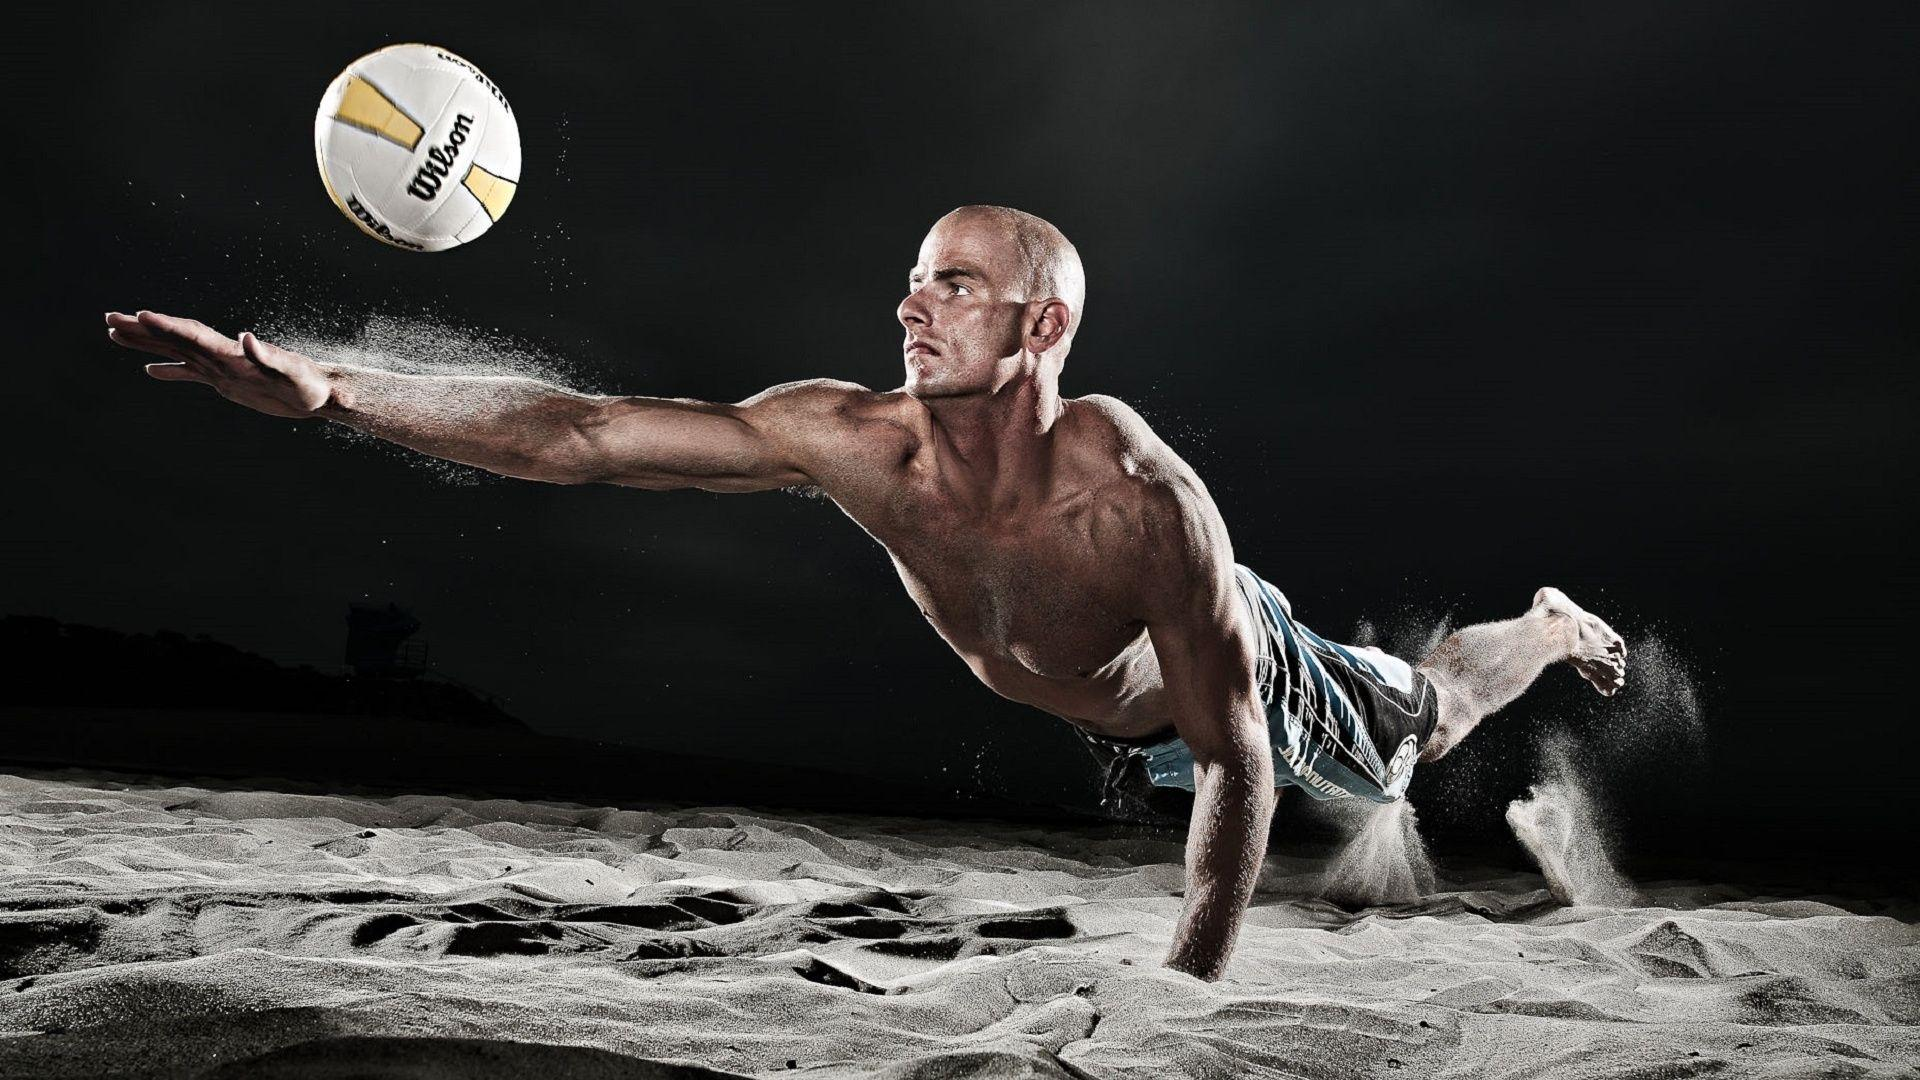 Sport Wallpaper Volleyball: Volleyball HD Wallpapers